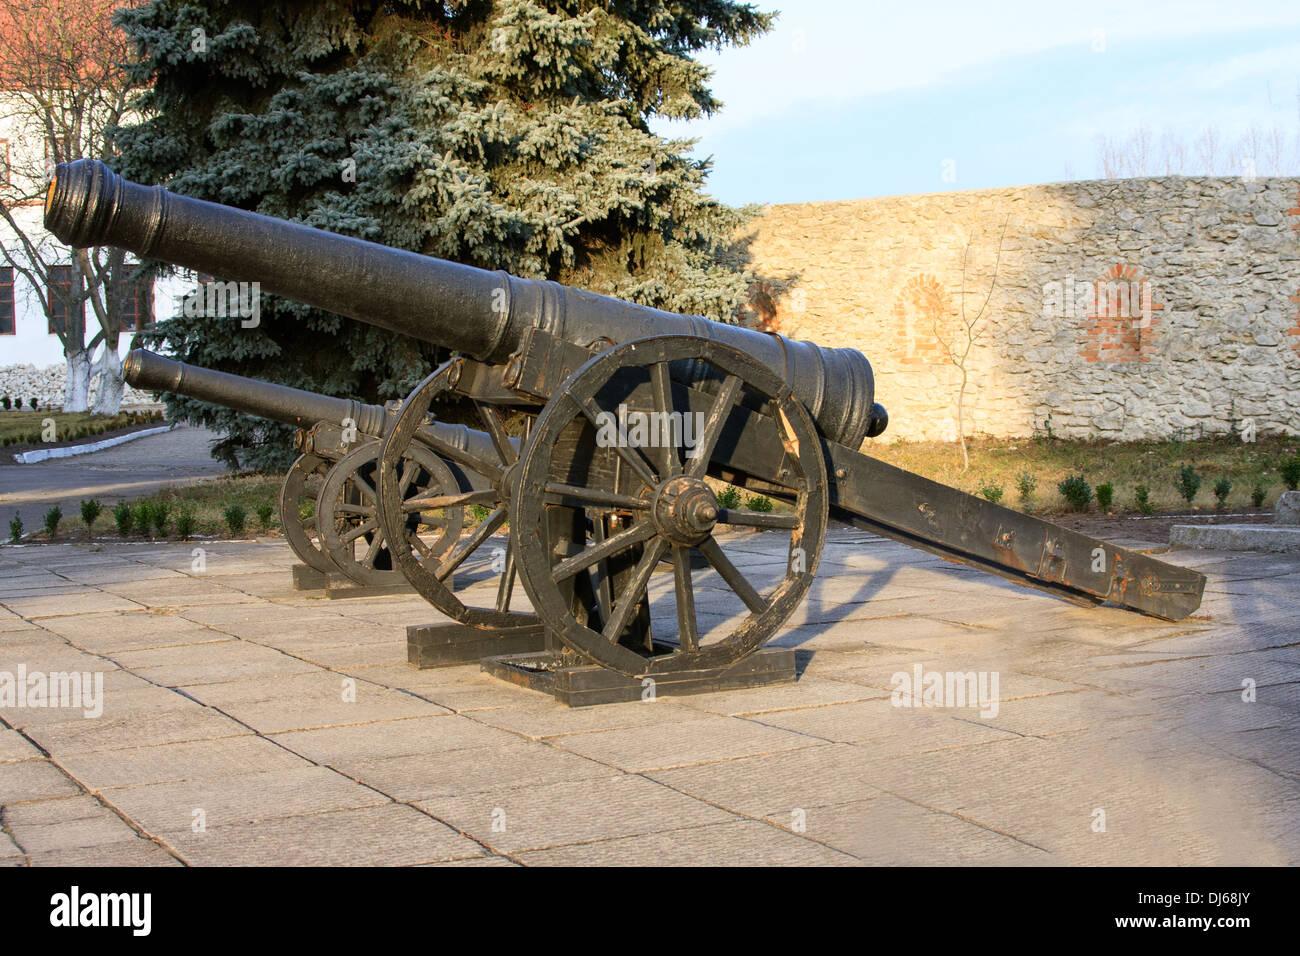 Ancient cannon on wheels. Dubno Castle. Ukraine - Stock Image